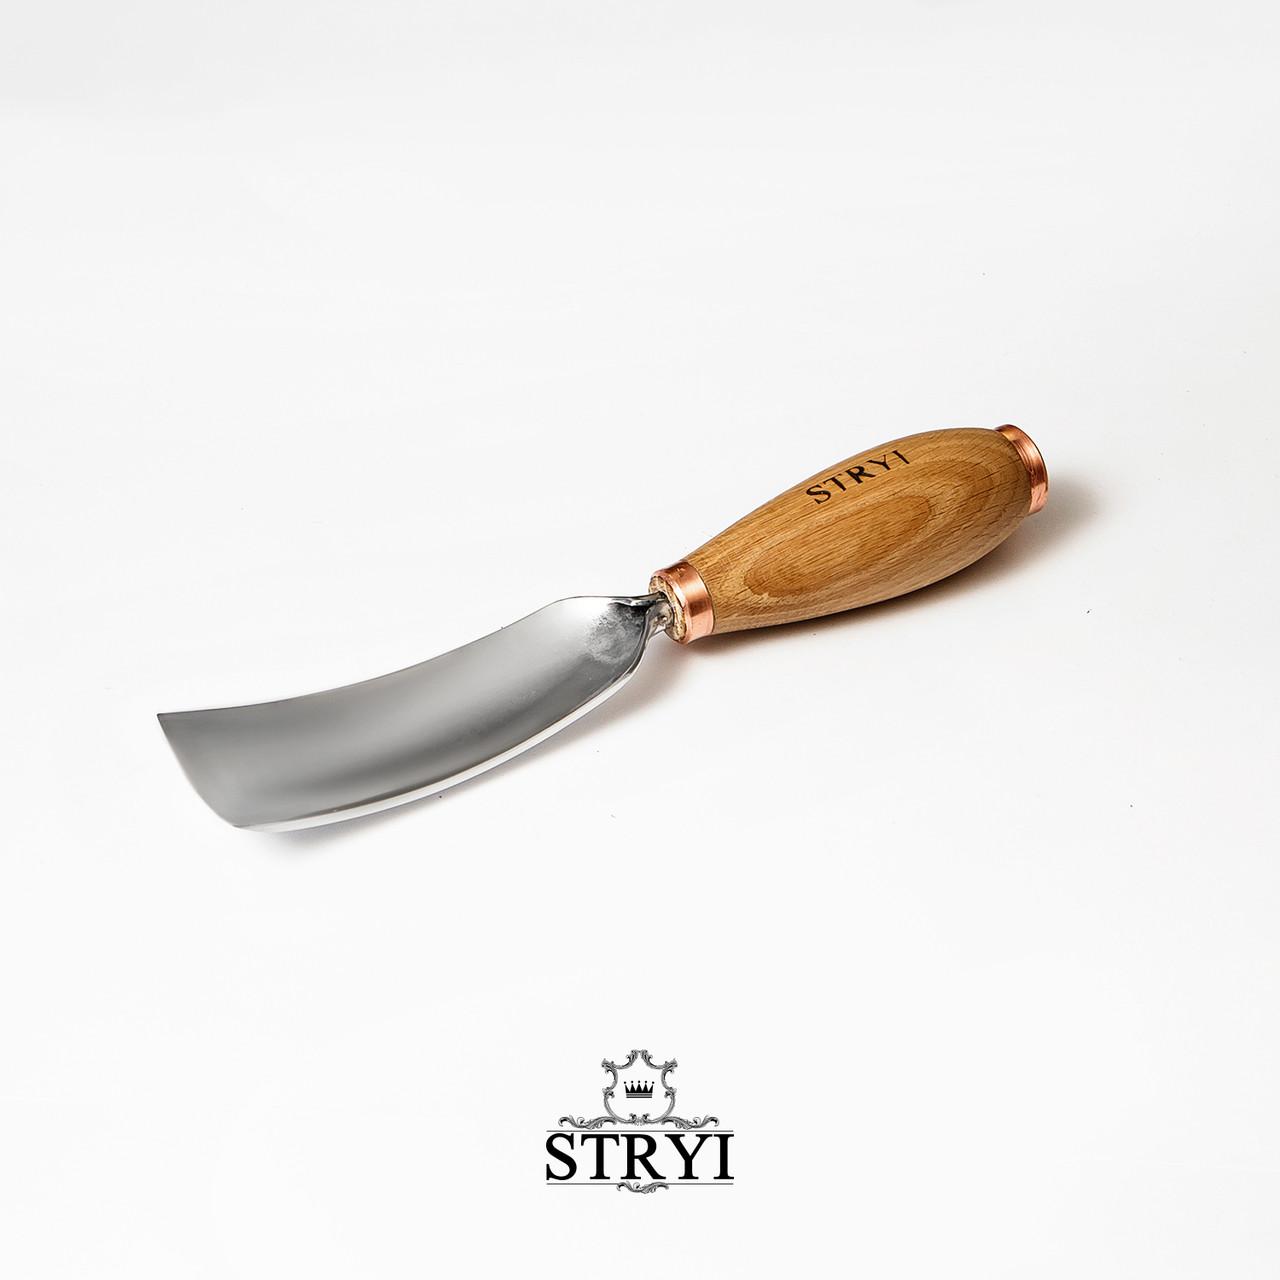 Ударная отлогая клюкарза 60мм №7 для резьбы по дереву от производителя STRYI